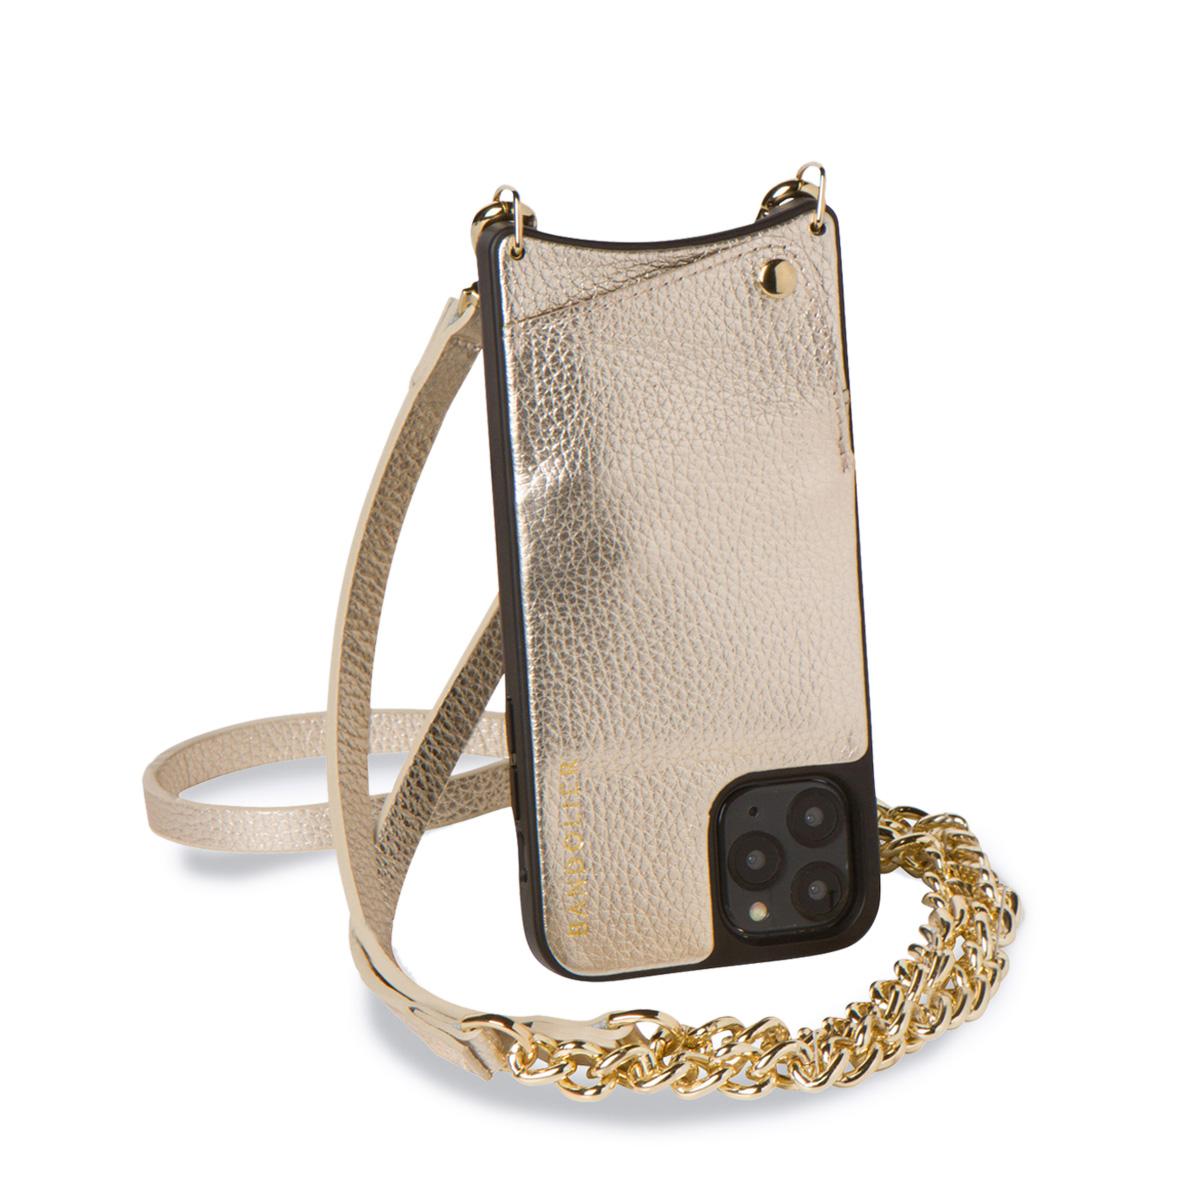 BANDOLIER バンドリヤー iPhone11 Pro ケース スマホ 携帯 ショルダー アイフォン レクシー メンズ レディース LEXI ゴールド 10LEX